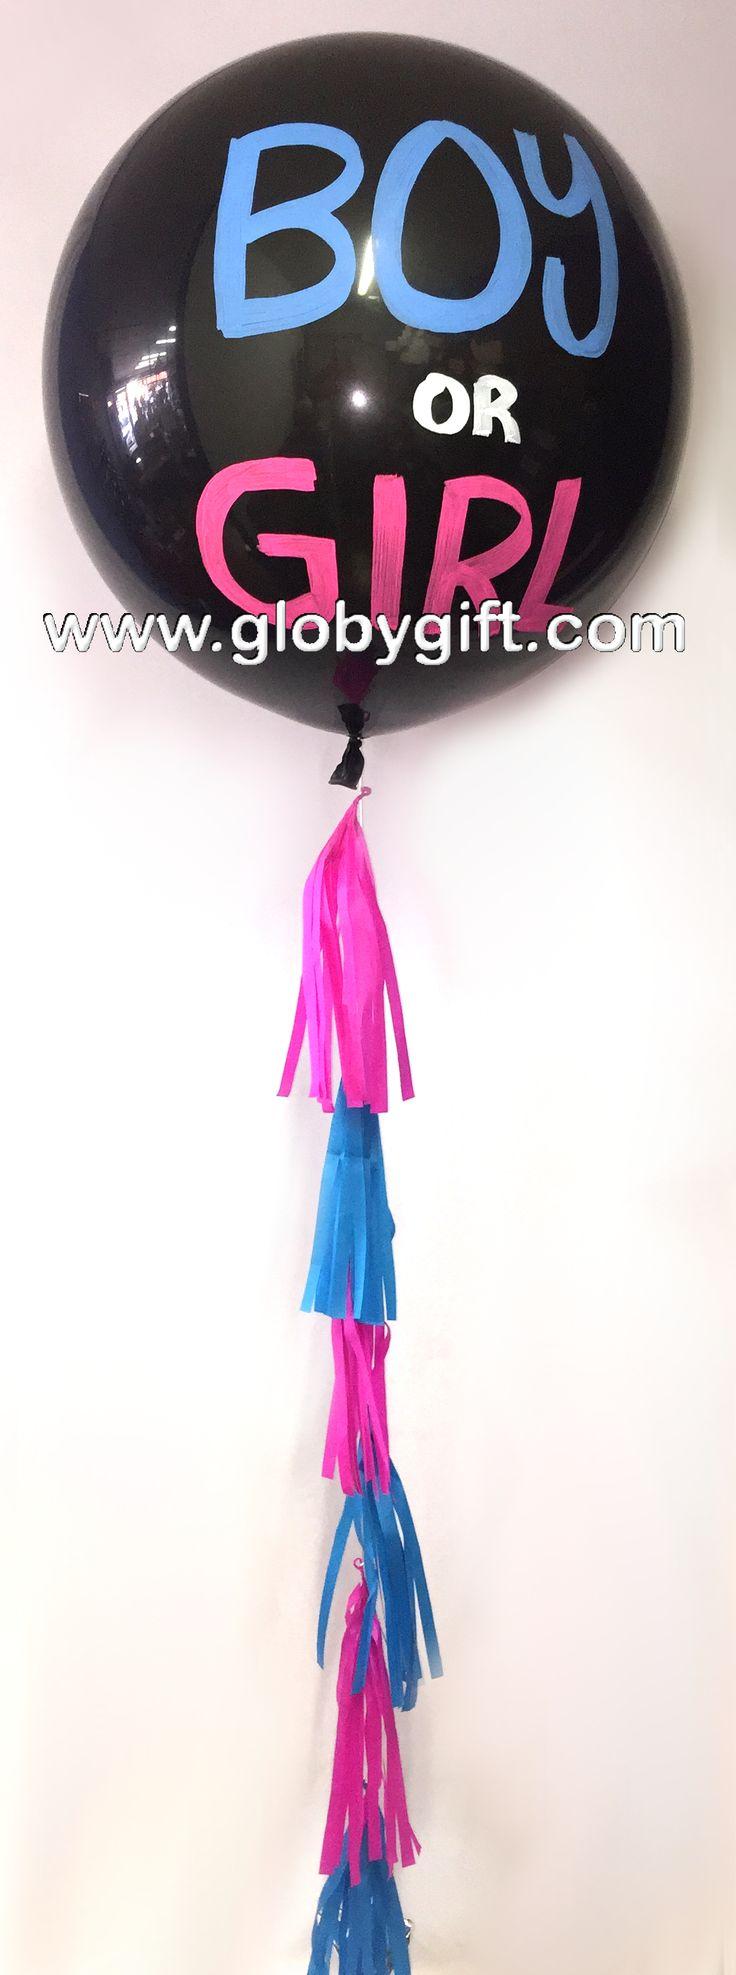 BOY OR GIRL Globo gigante de látex para revelar el sexo del bebé / Giant balloon gender reveal